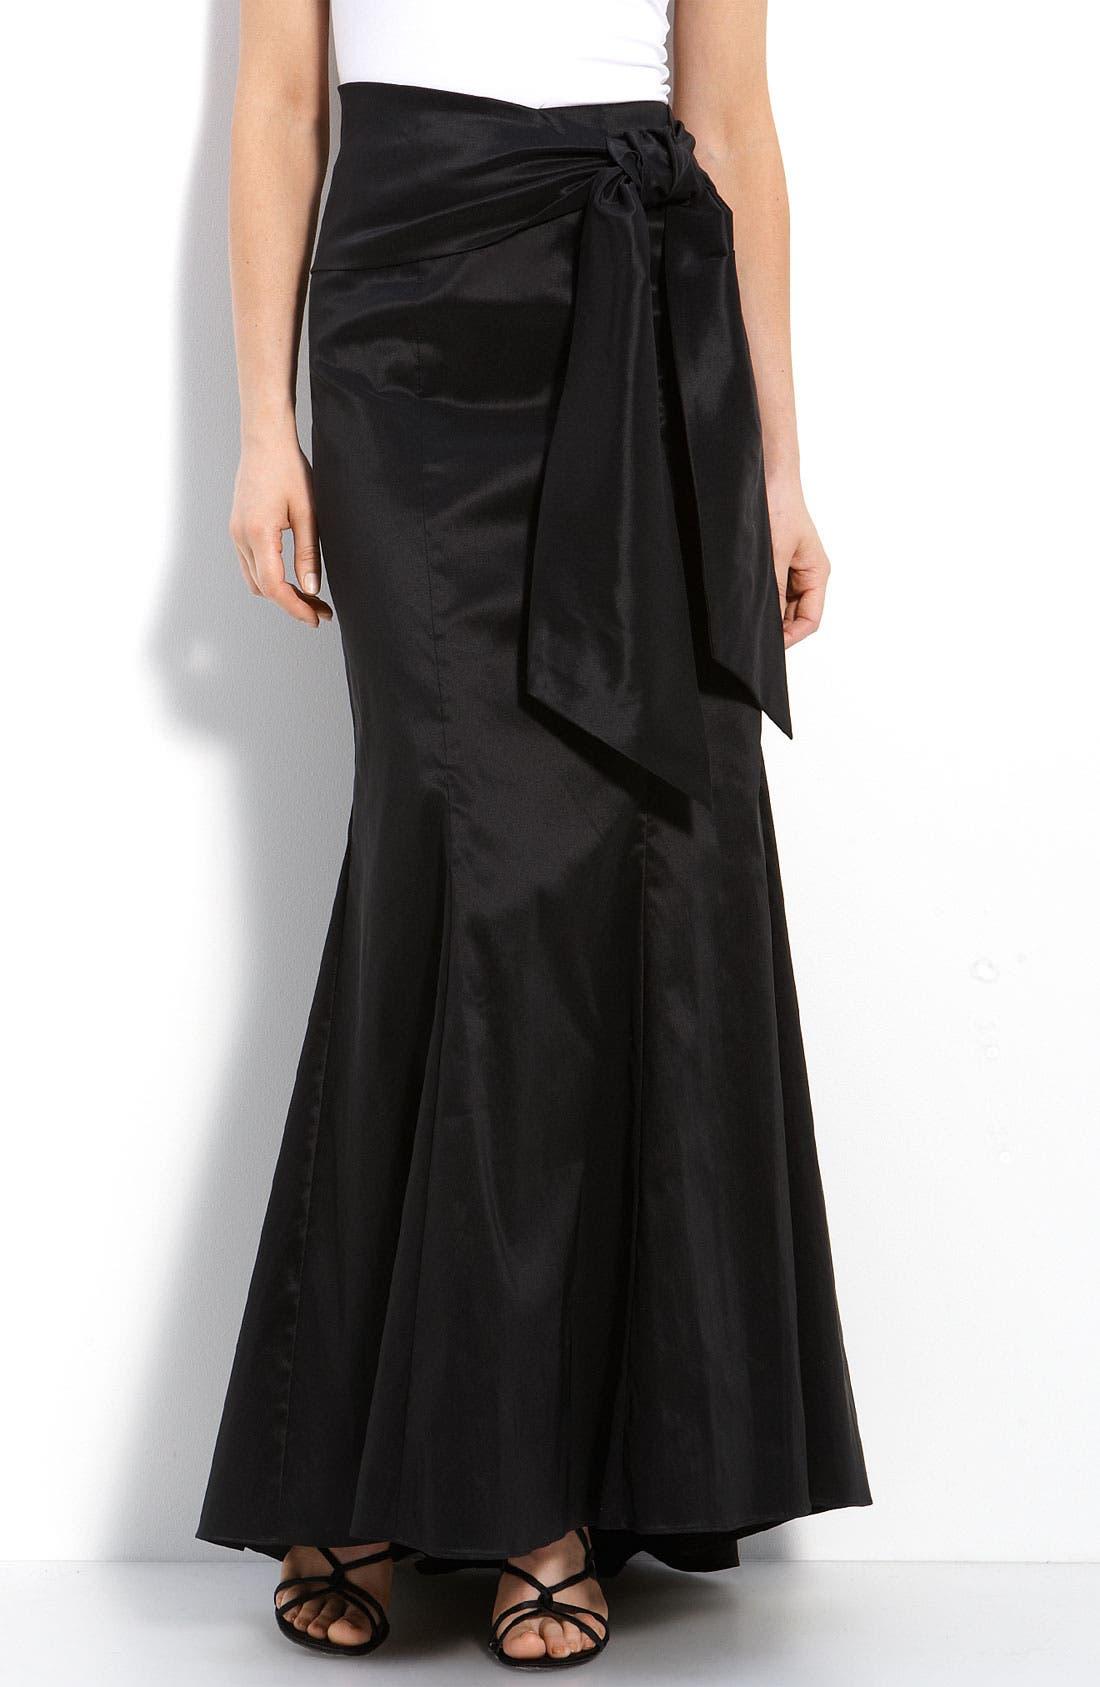 Alternate Image 1 Selected - Adrianna Papell Taffeta Skirt